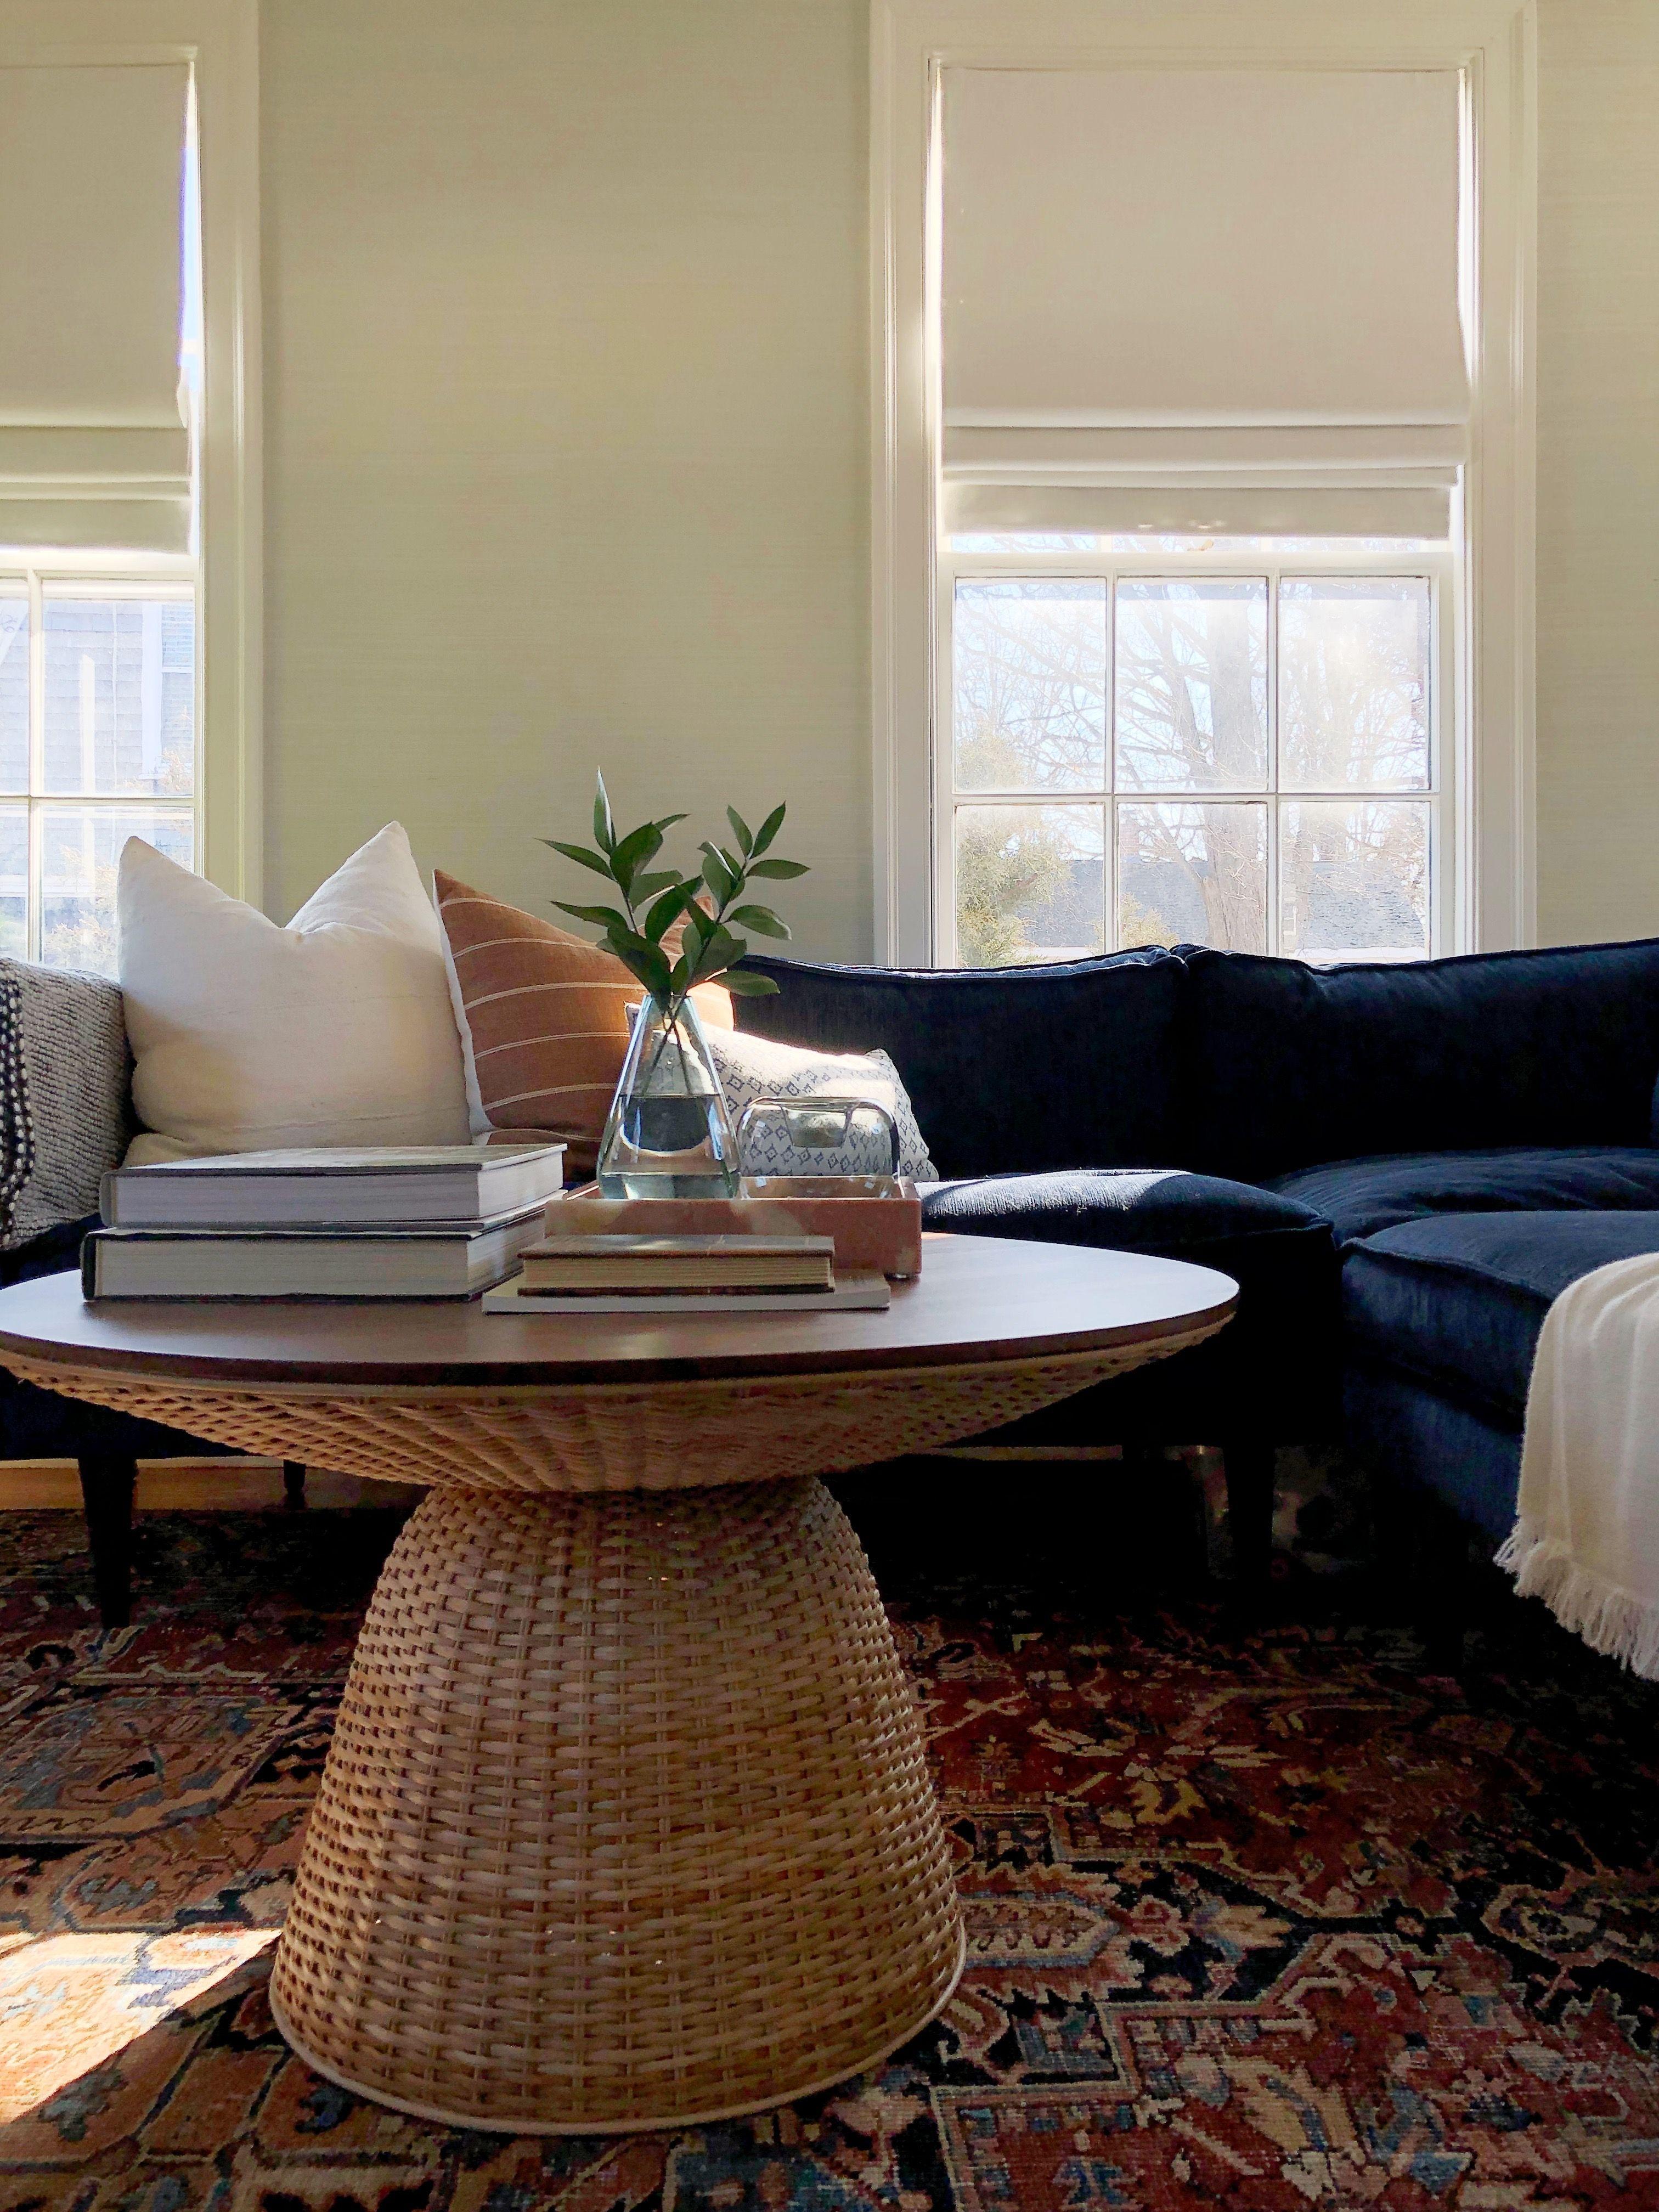 Organic Modern Living Room Trim Design Co In 2020 Oriental Living Room Furniture Coastal Decorating Living Room Rugs In Living Room #trim #ideas #for #living #room